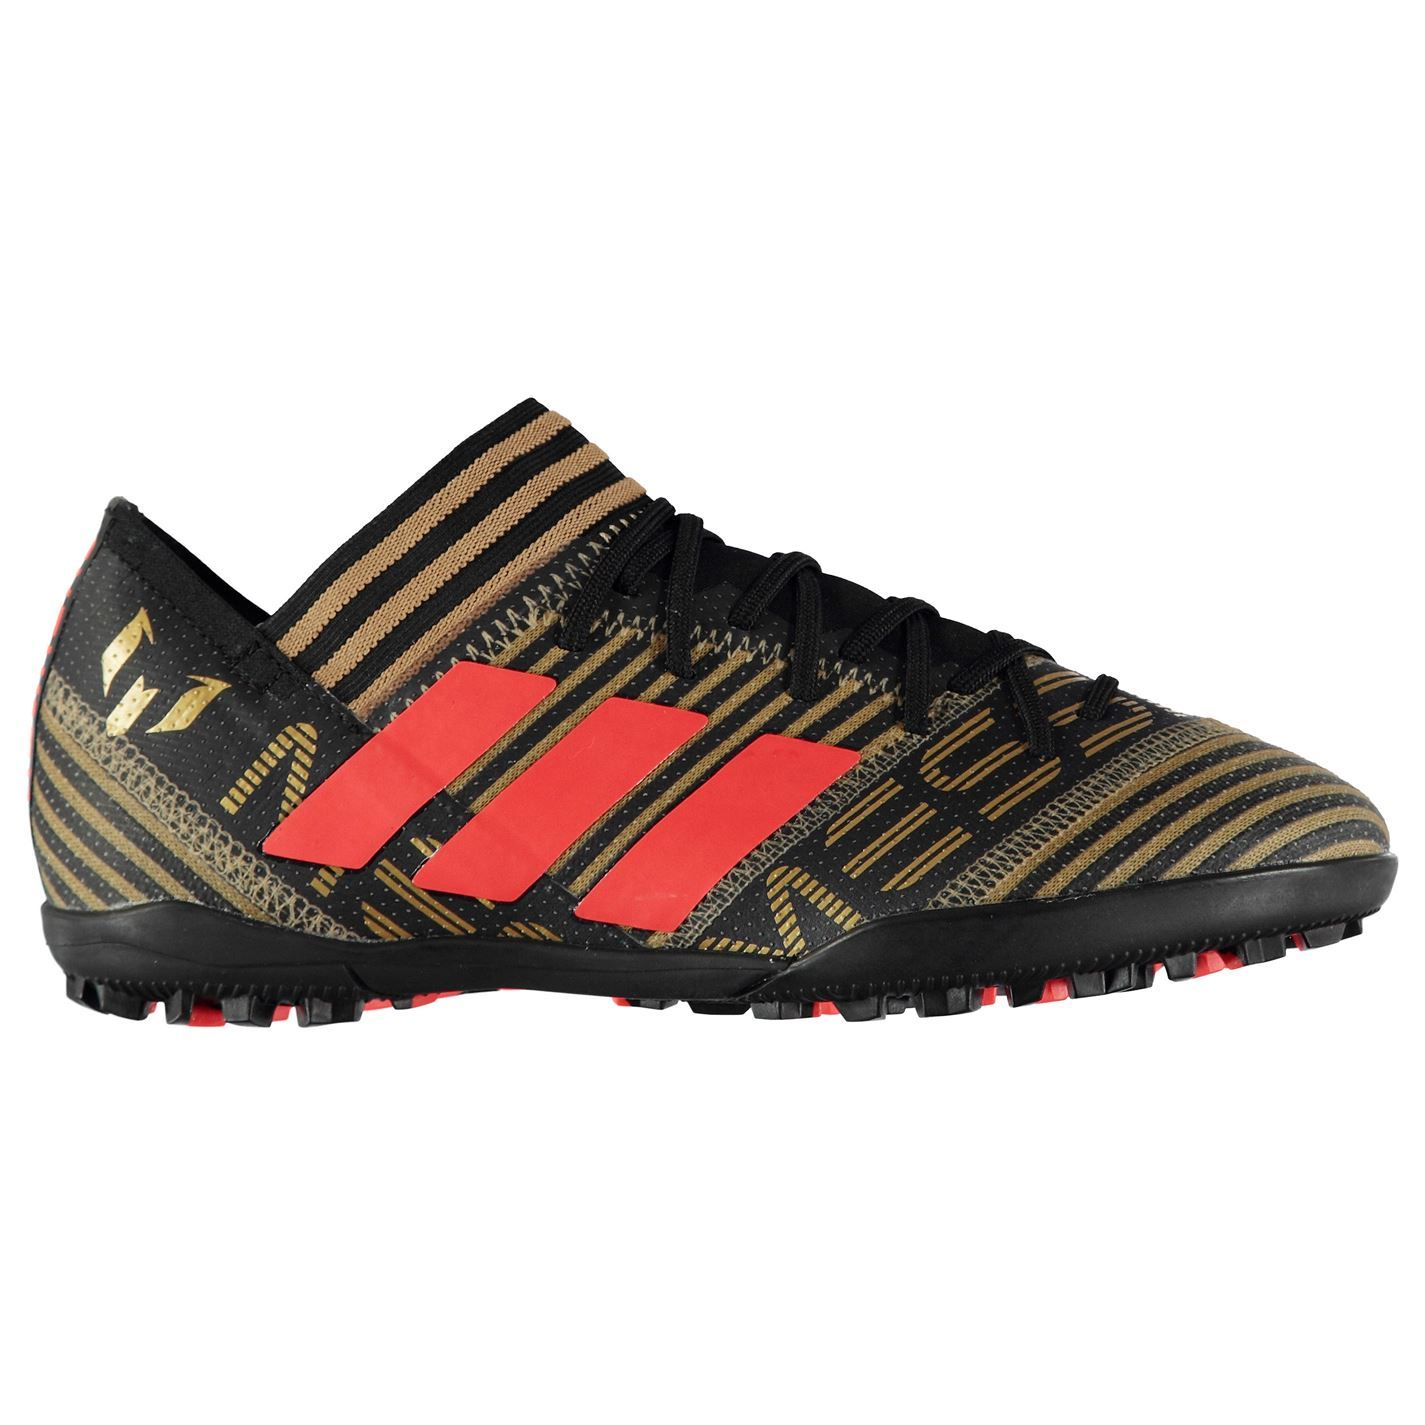 5b2e09460be5 adidas Mens Nemeziz Messi Tango 17.3 Astro Turf Trainers Football Boots  Lace Up